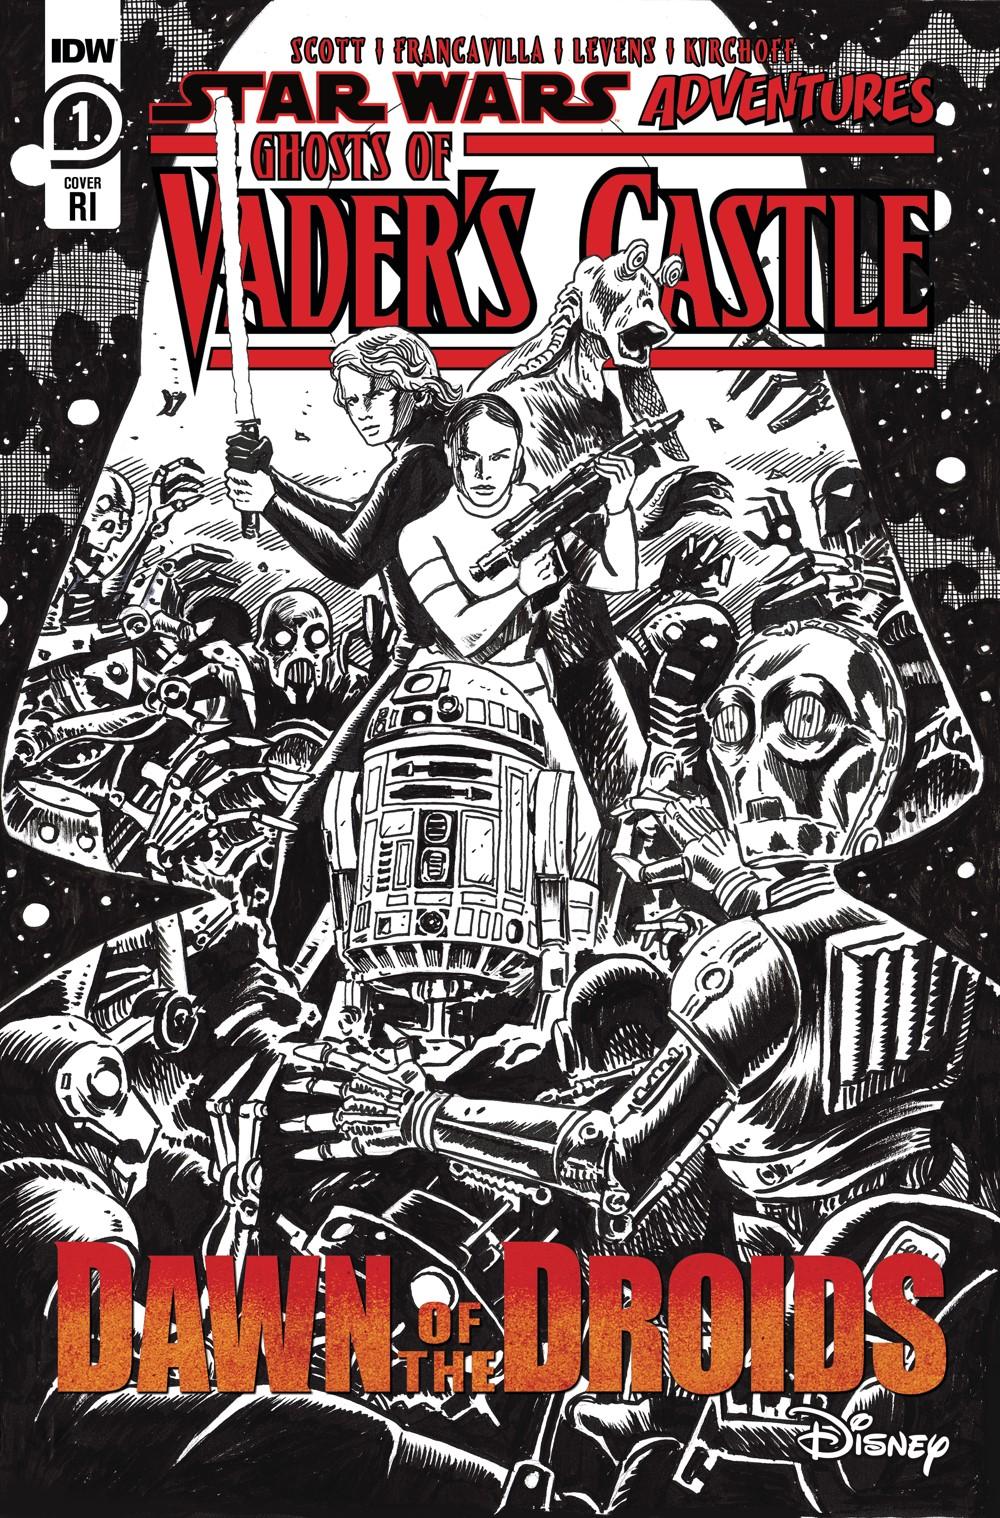 SW_GoVC01-CvrRI ComicList Previews: STAR WARS ADVENTURES GHOST OF VADER'S CASTLE #1 (OF 5)